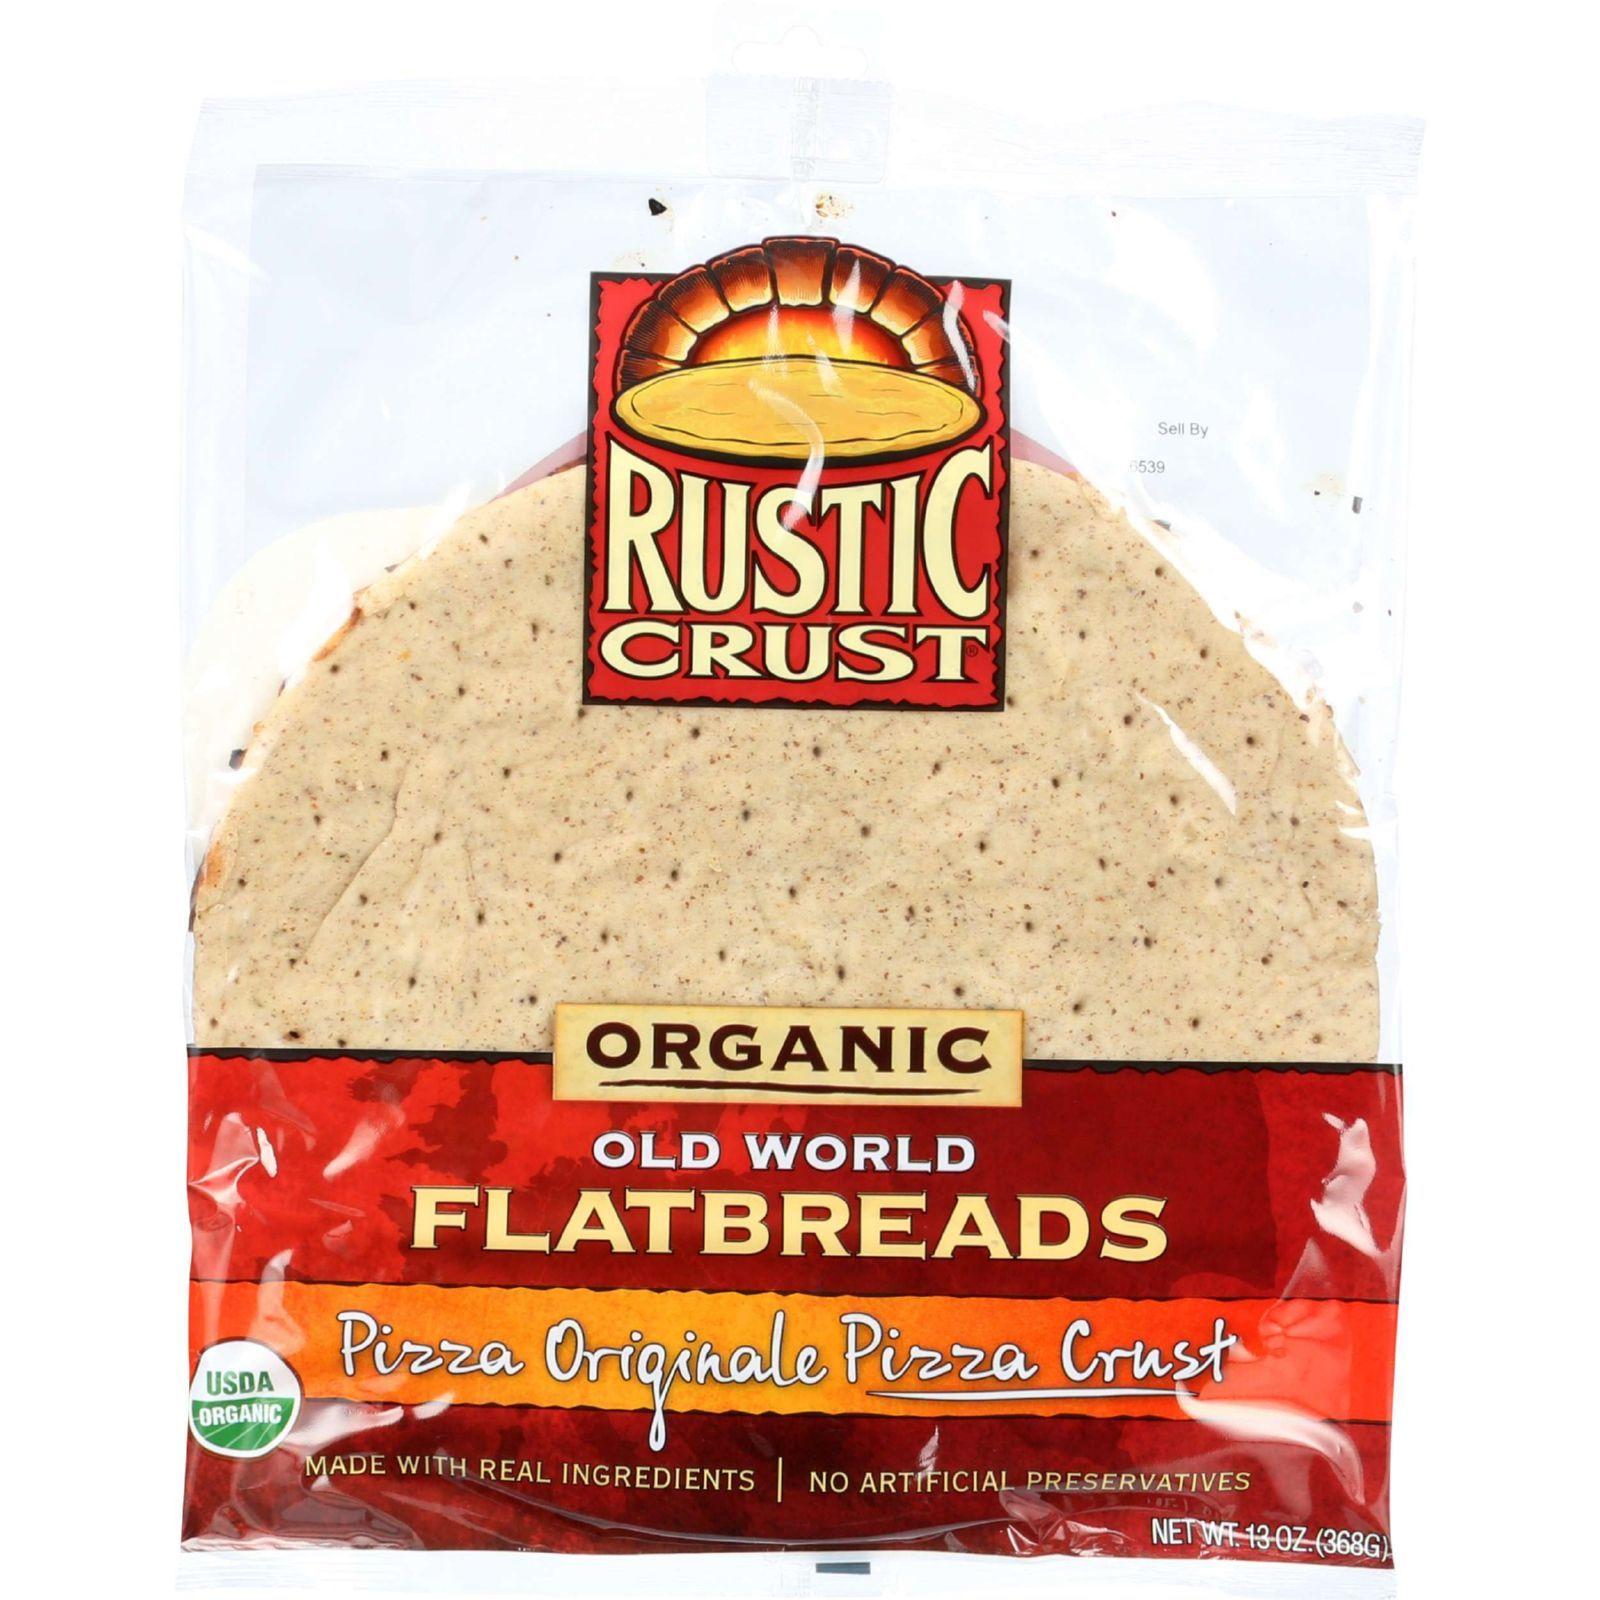 Rustic Crust Pizza Crust - Organic - Flatbreads - Pizza Originale - 13 oz - case of 8